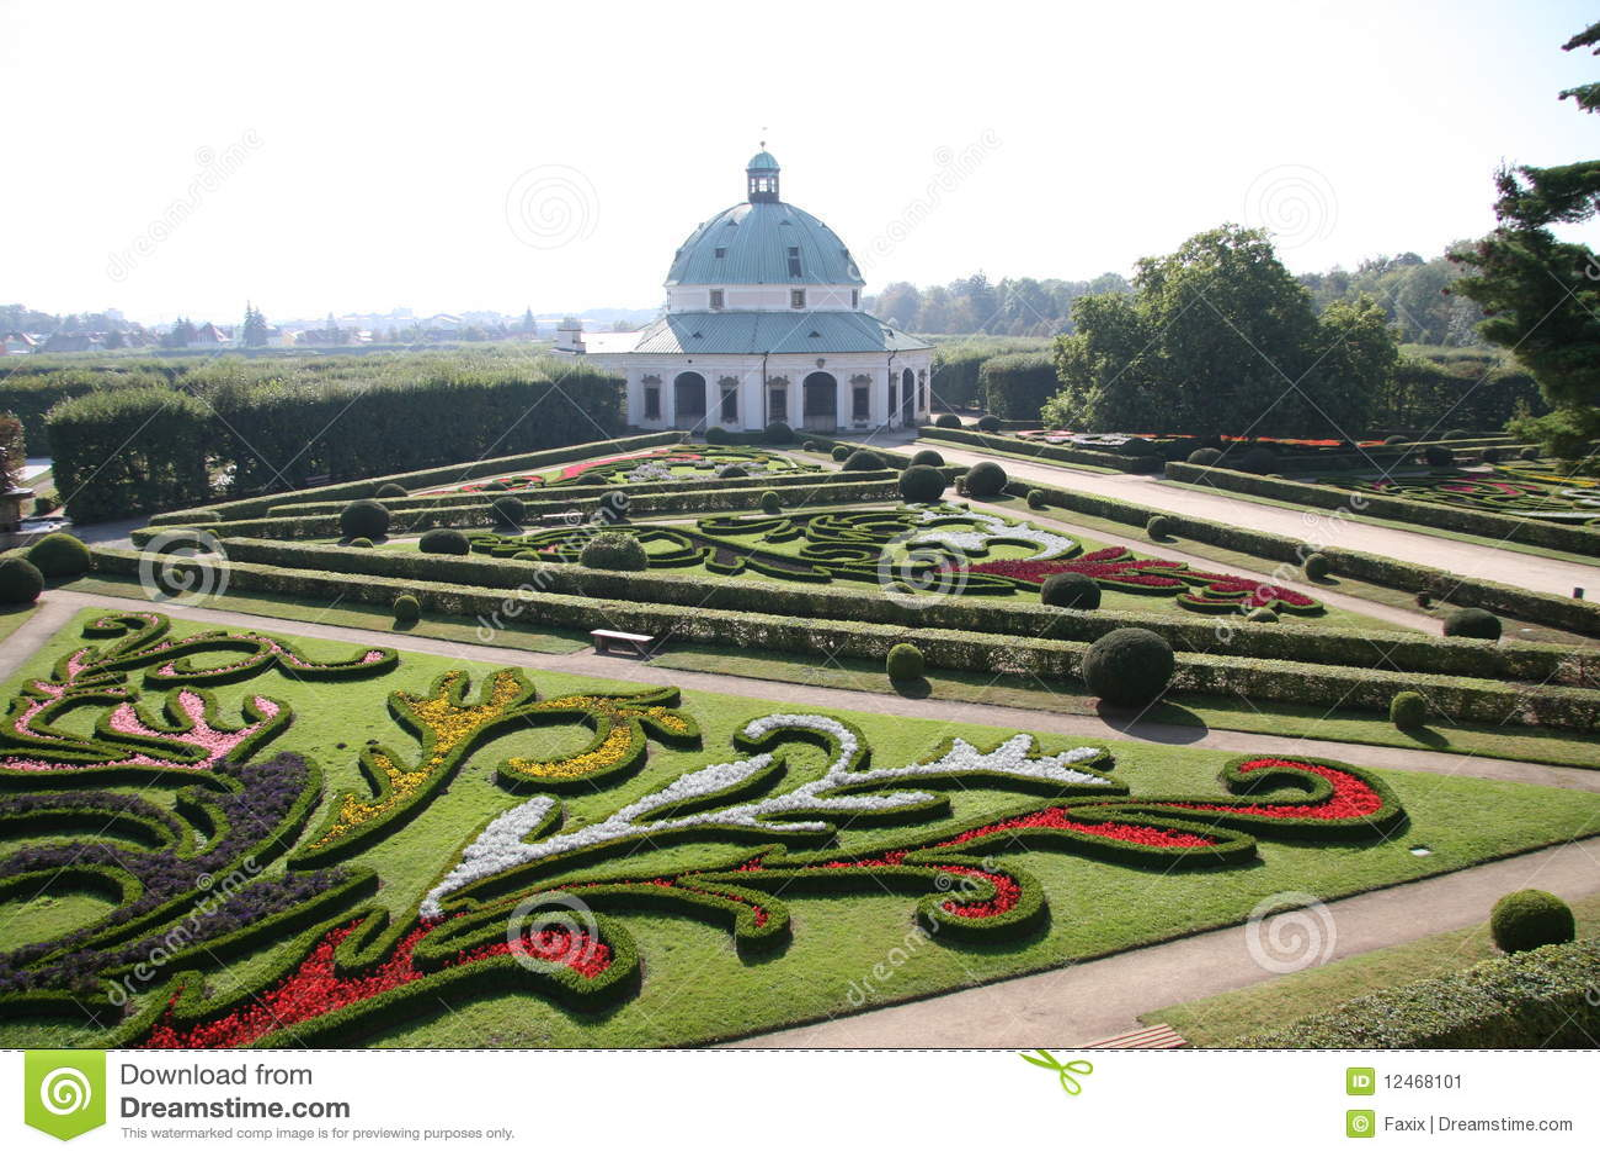 Blumengarten Bilder blumengarten kromeriz stockbild bild 12468101